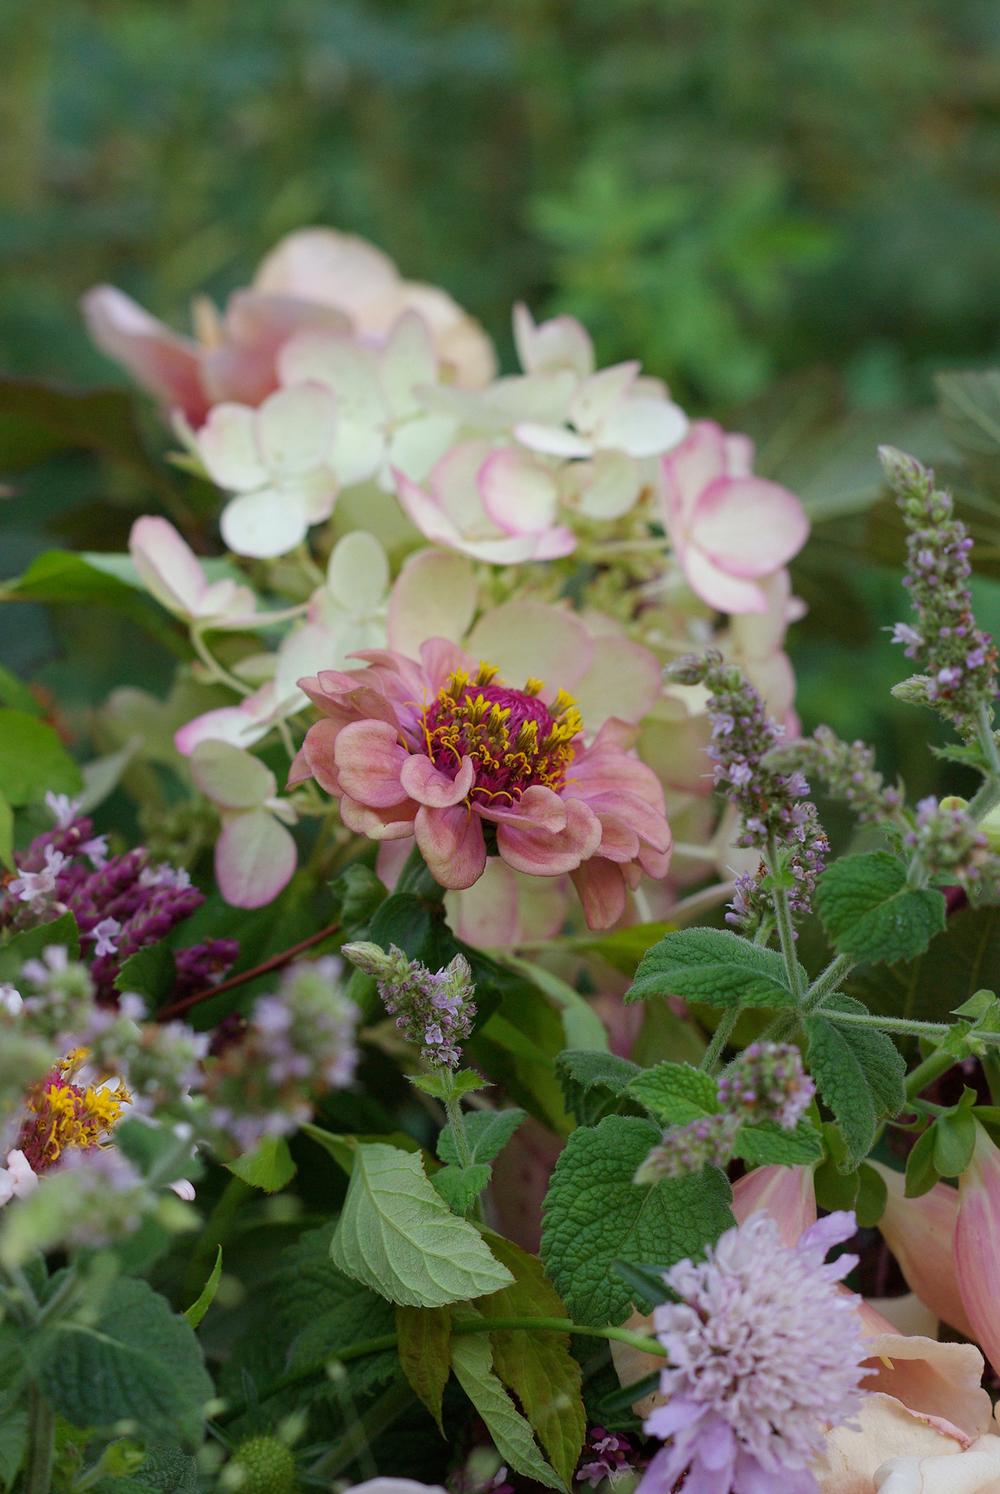 Late August - zinnias, mint, scabiosa, oregano, foxglove, hydrangea, roses